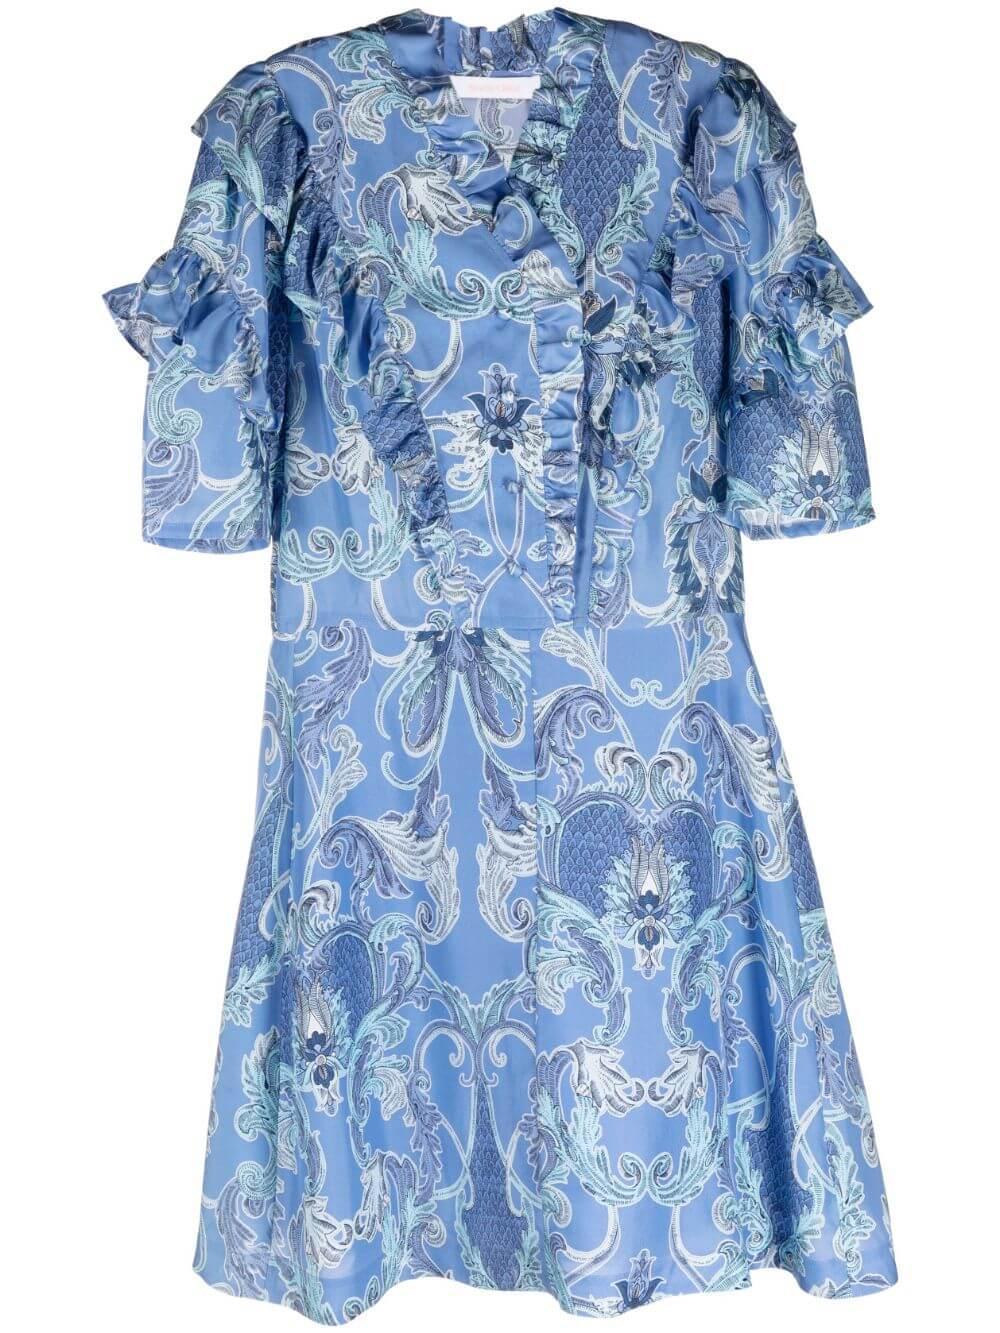 Paisley Printed Silk Dress Item # CHS21URO06029